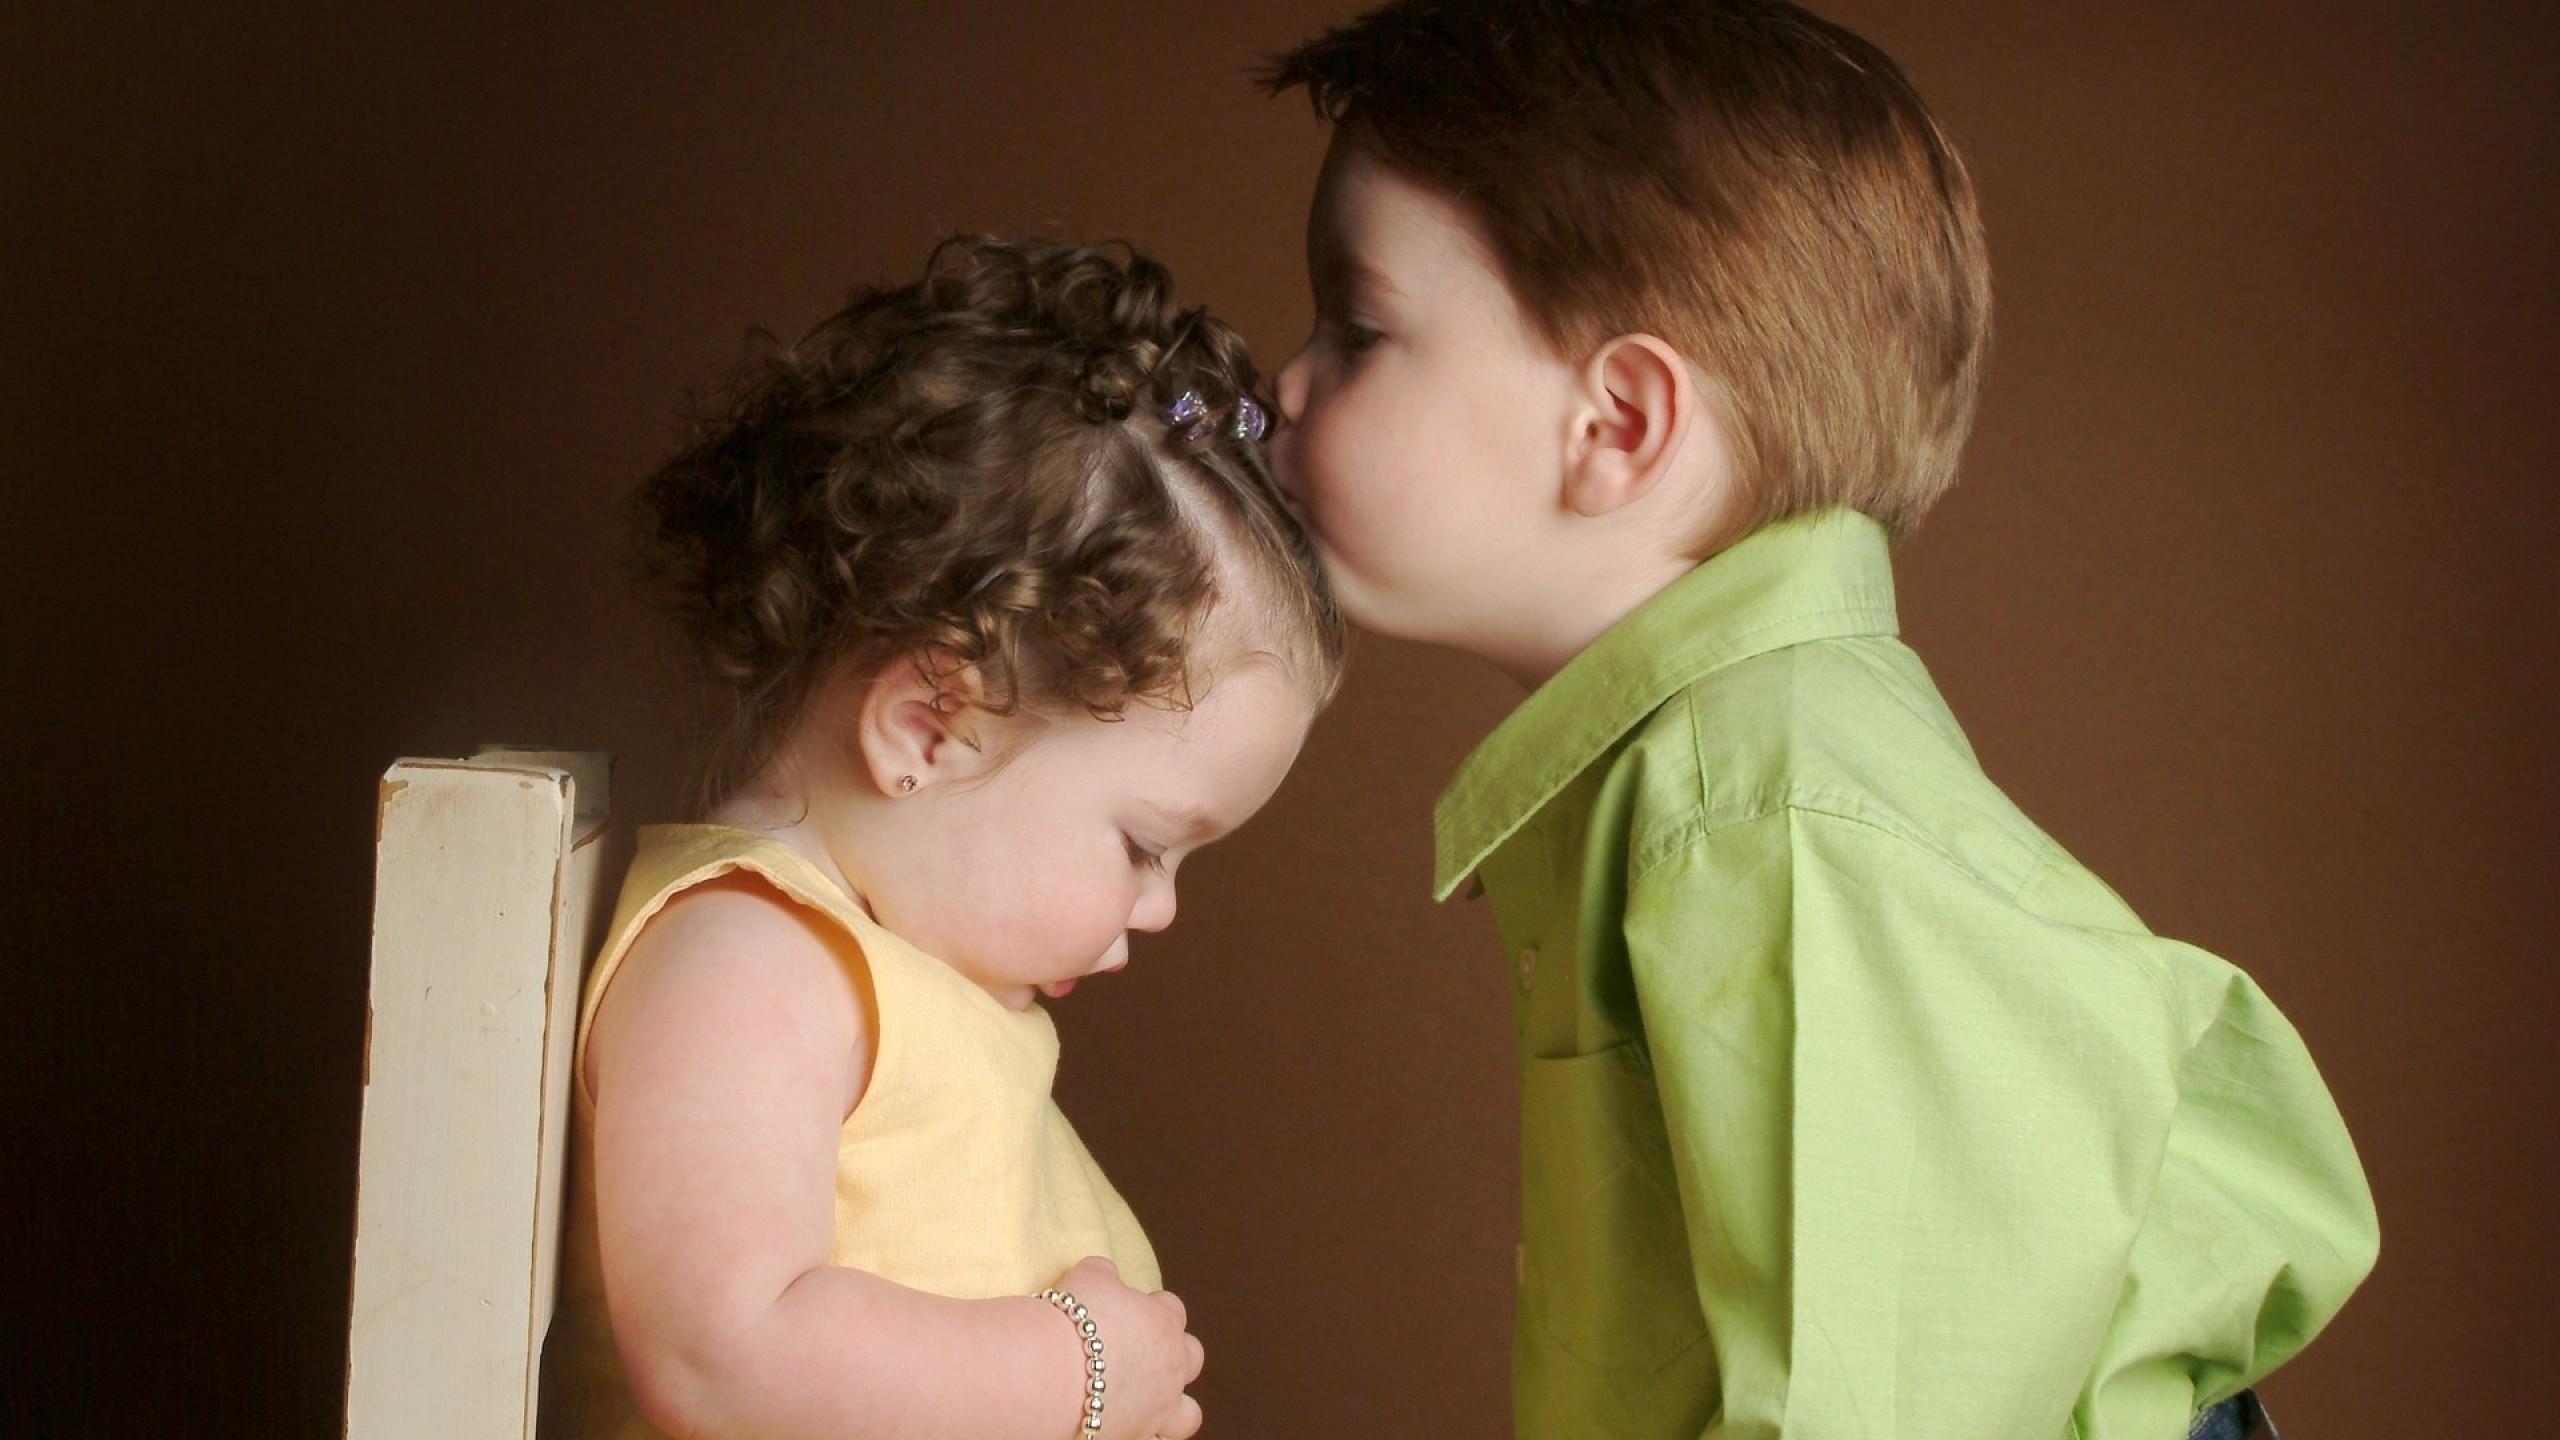 http://uupload.ir/files/qqoq_sweet-baby-kissing-hd-wallpapers.jpg